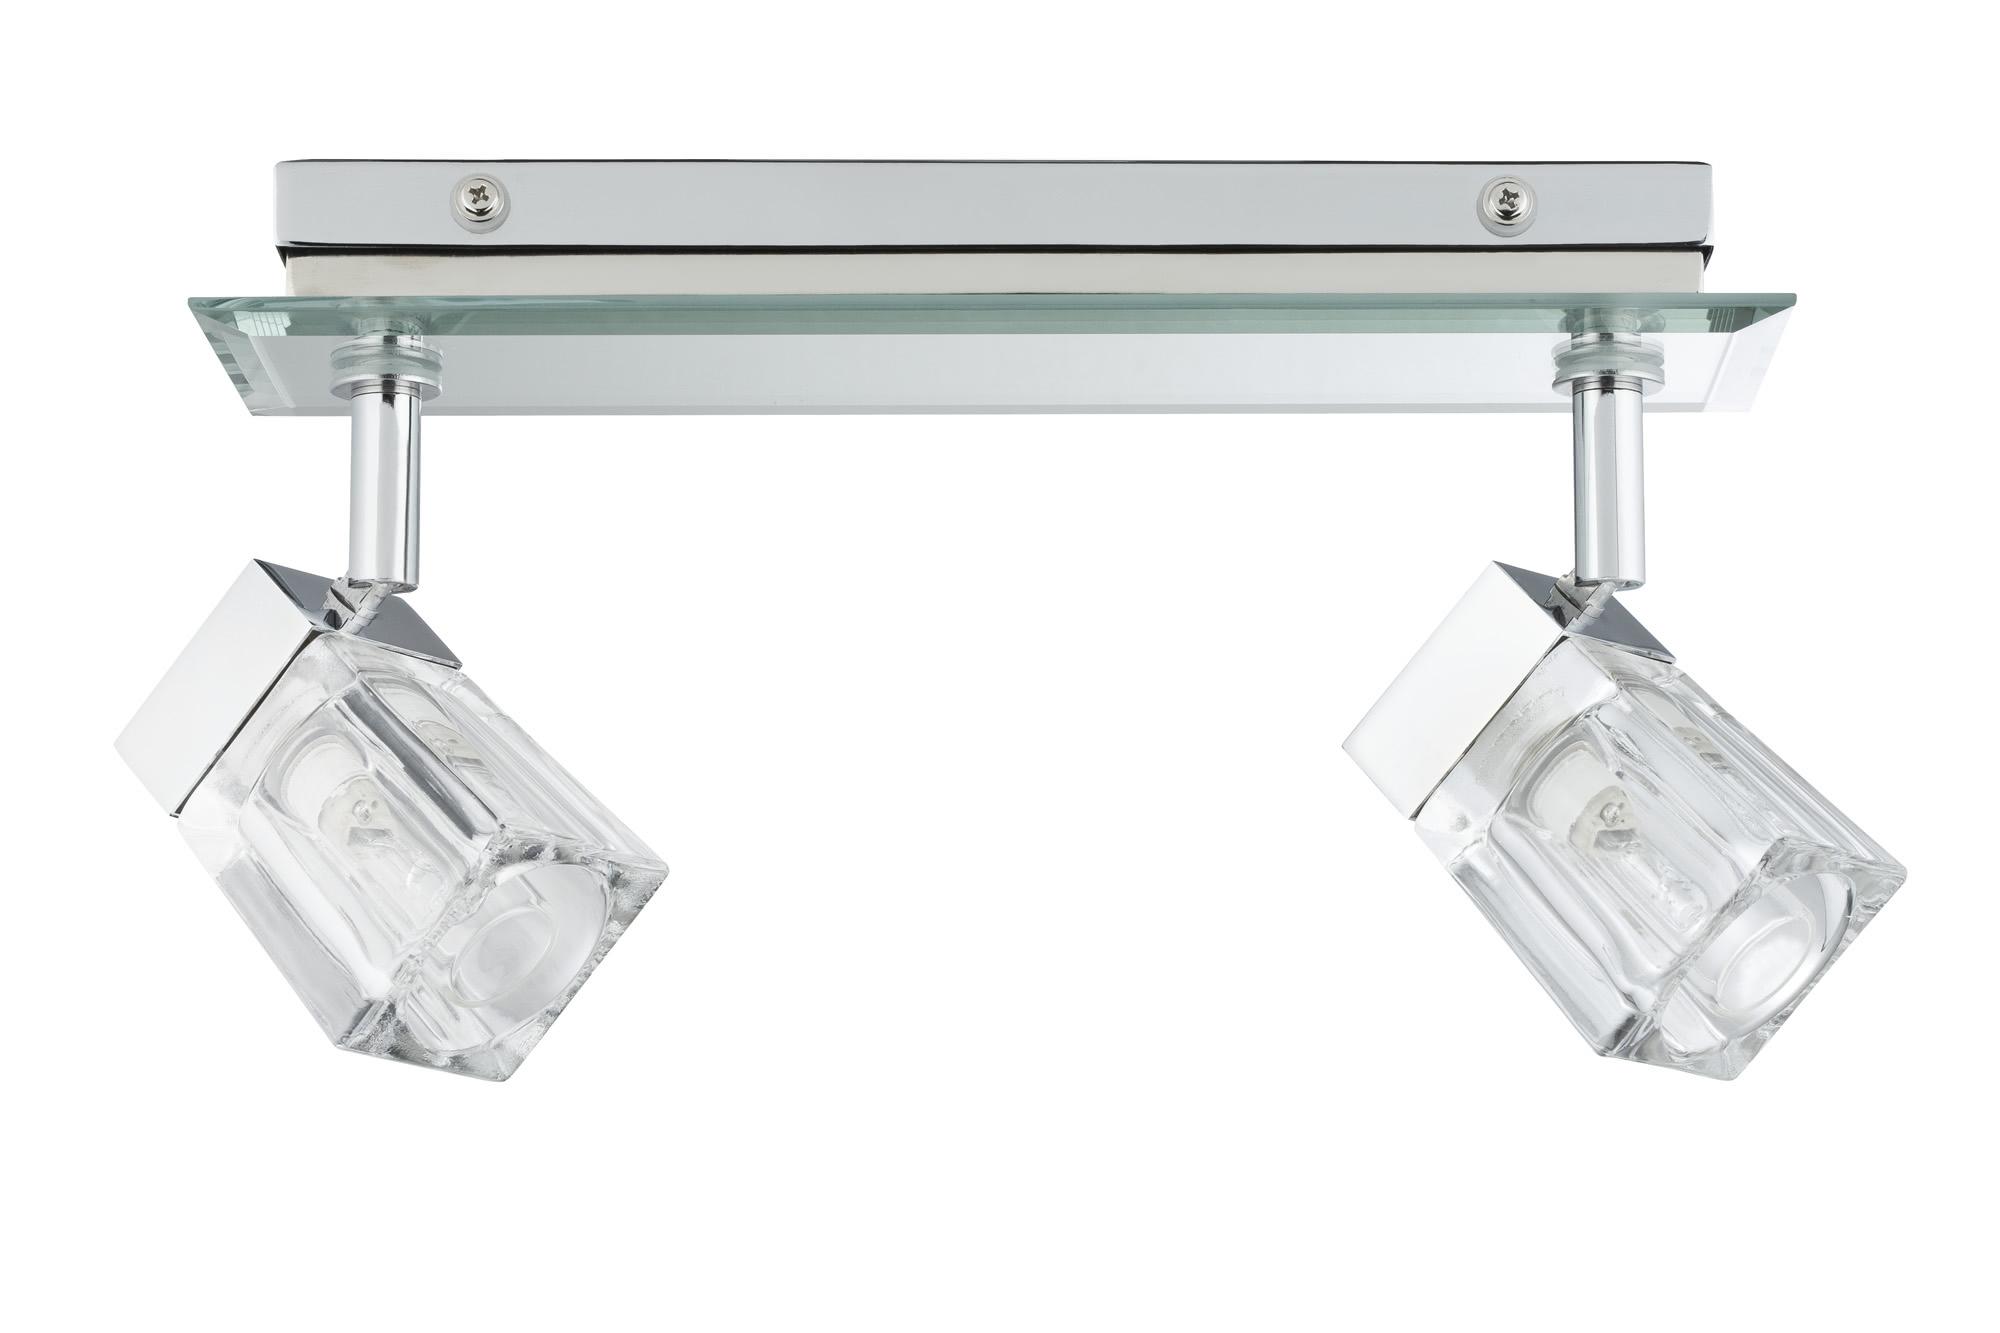 Paulmann. 70356 Светильник настенно-потолочный 2x20W Trabani 230V G9 Хром/Прозрачный